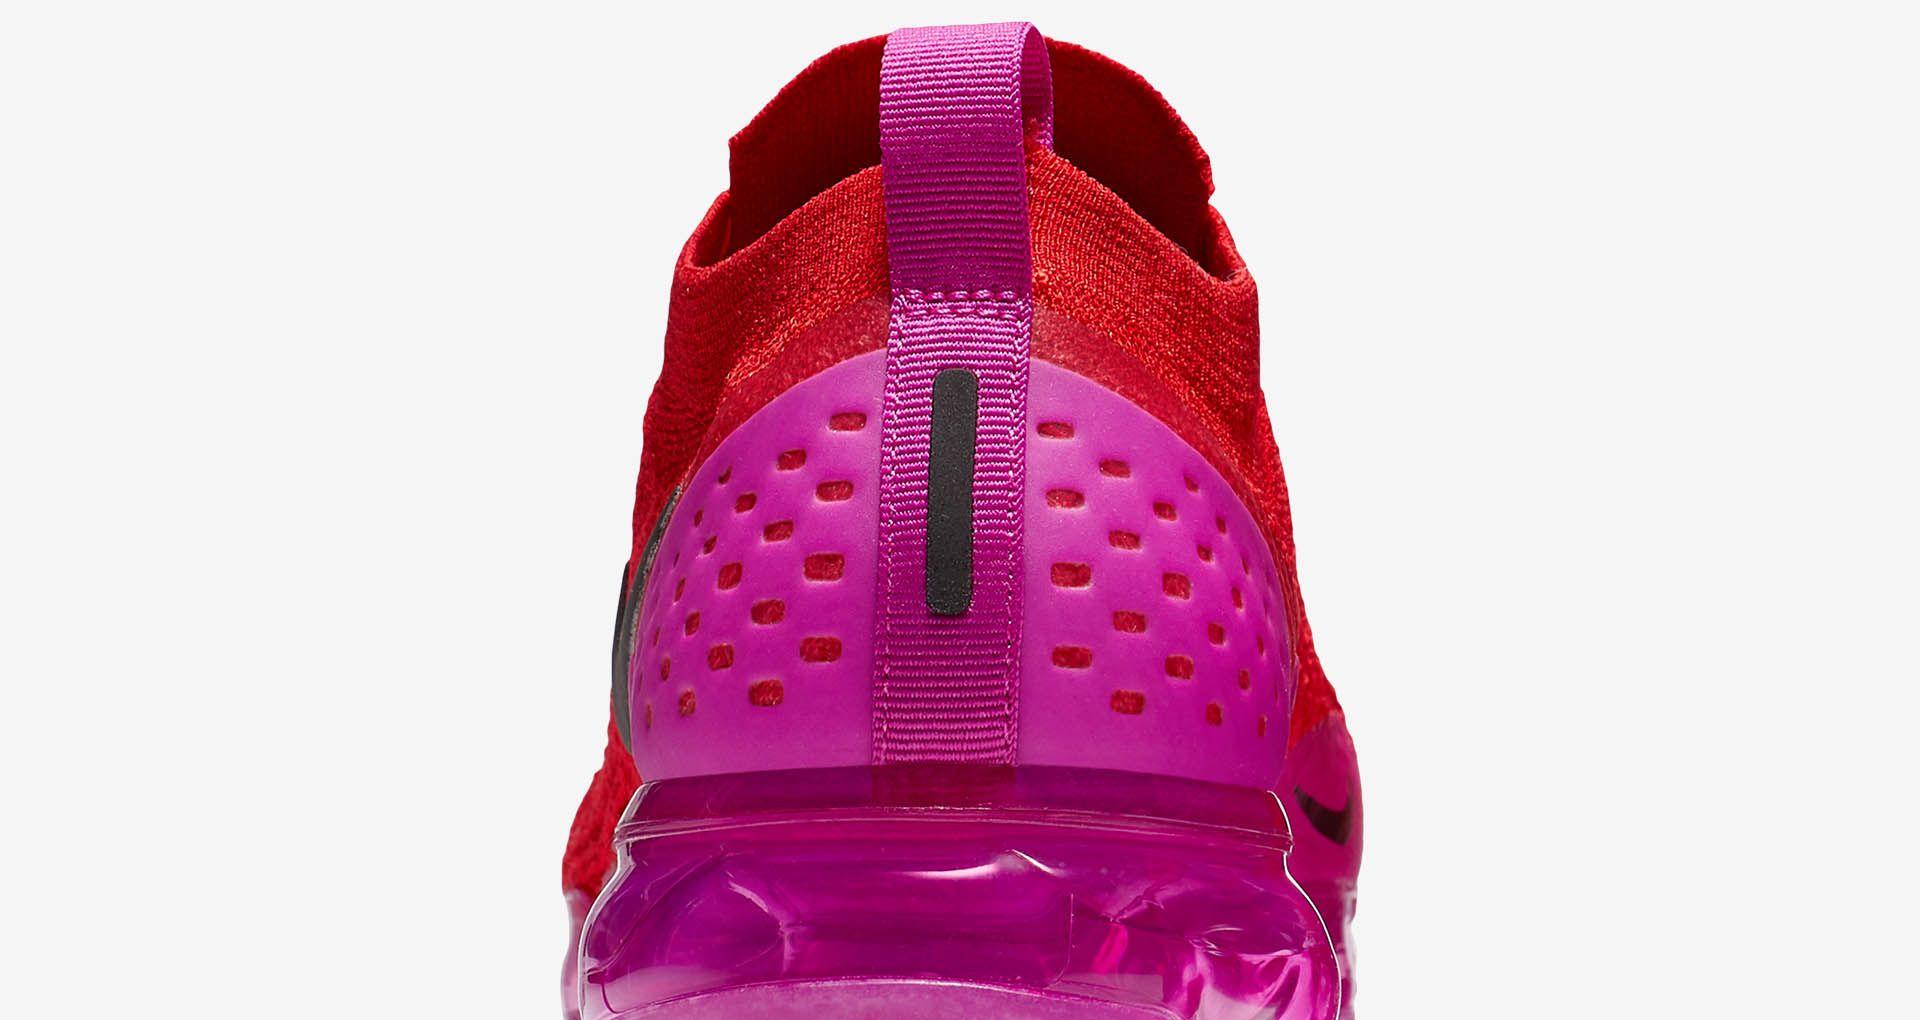 4b40af87eda52 Nike Women s Air Vapormax Moc 2  University Red   Fuchsia Blast  Release  Date